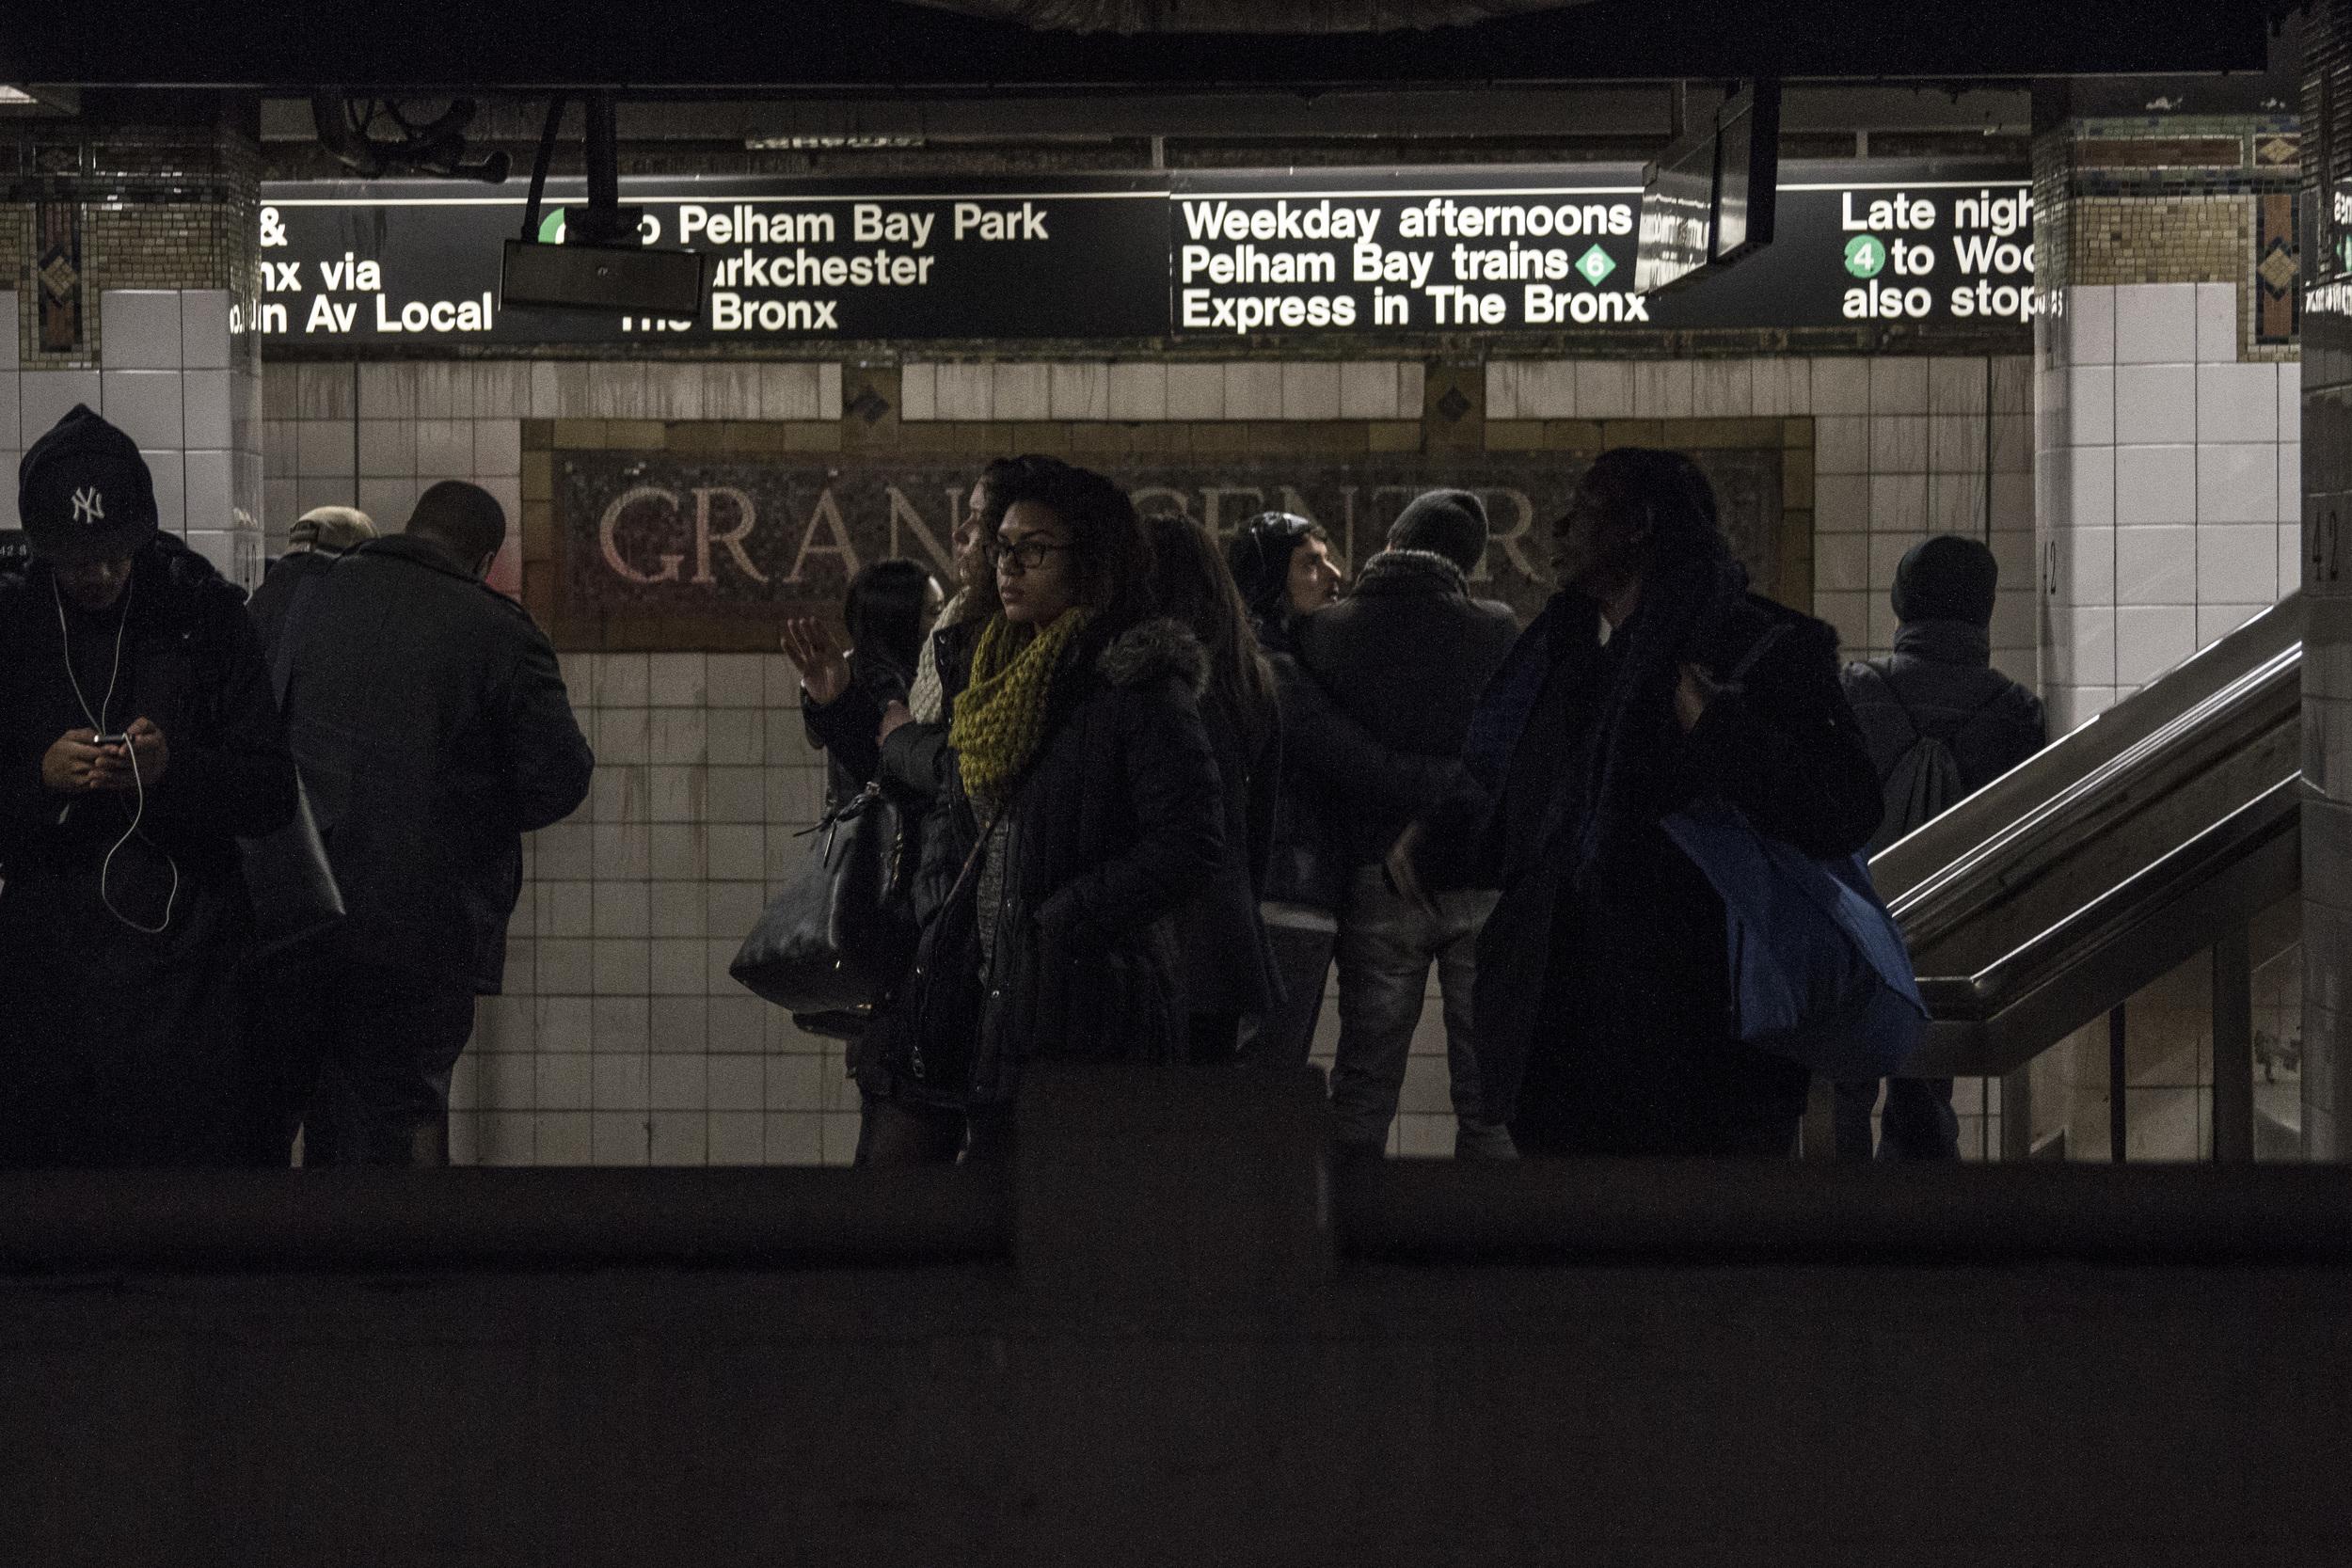 Grand Central - 4/5/6